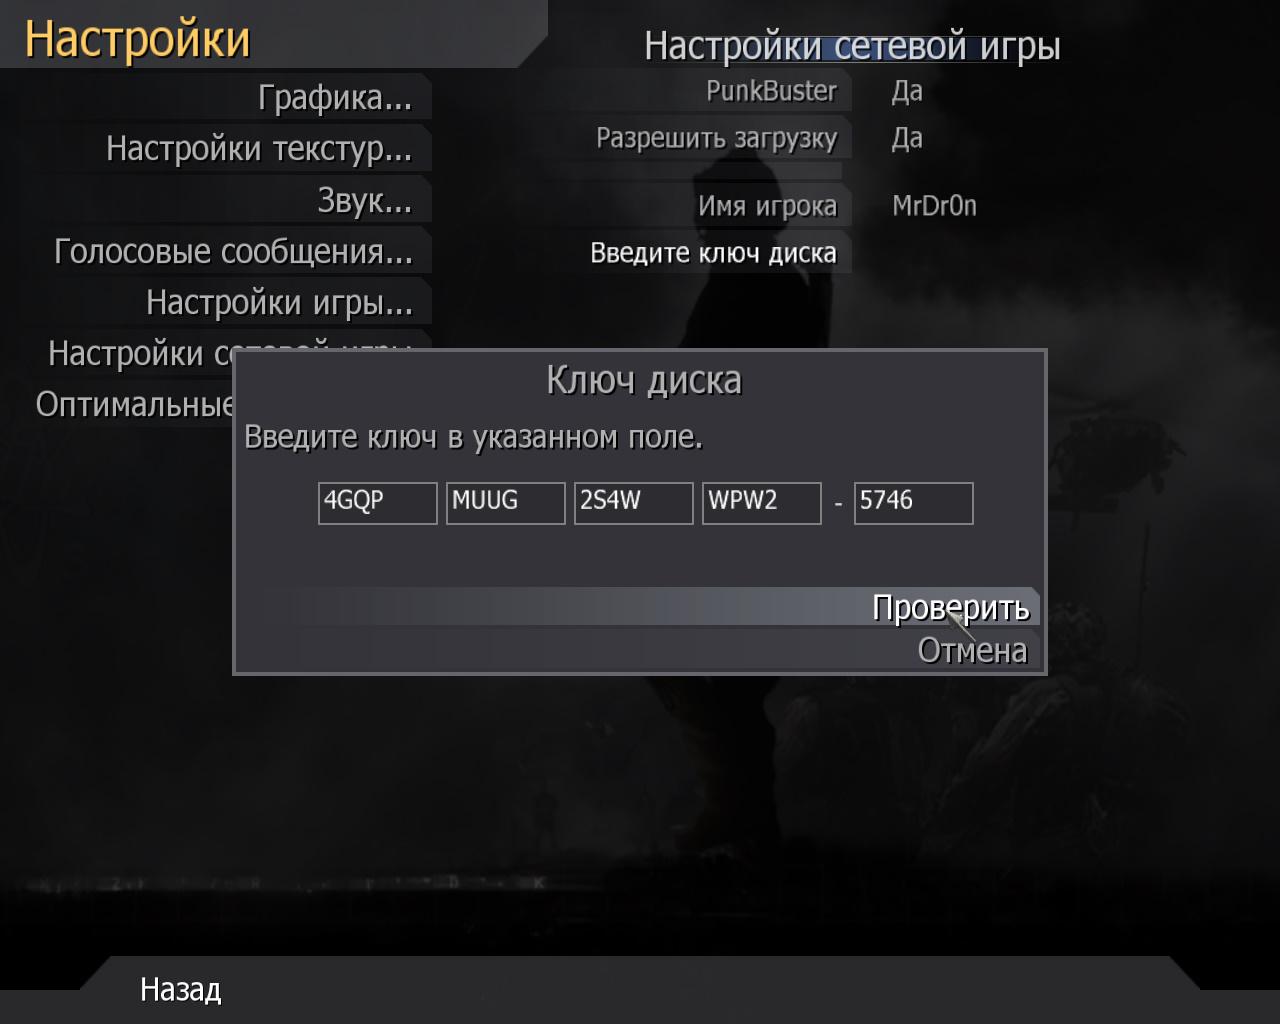 PUNKBUSTER COD4 PC